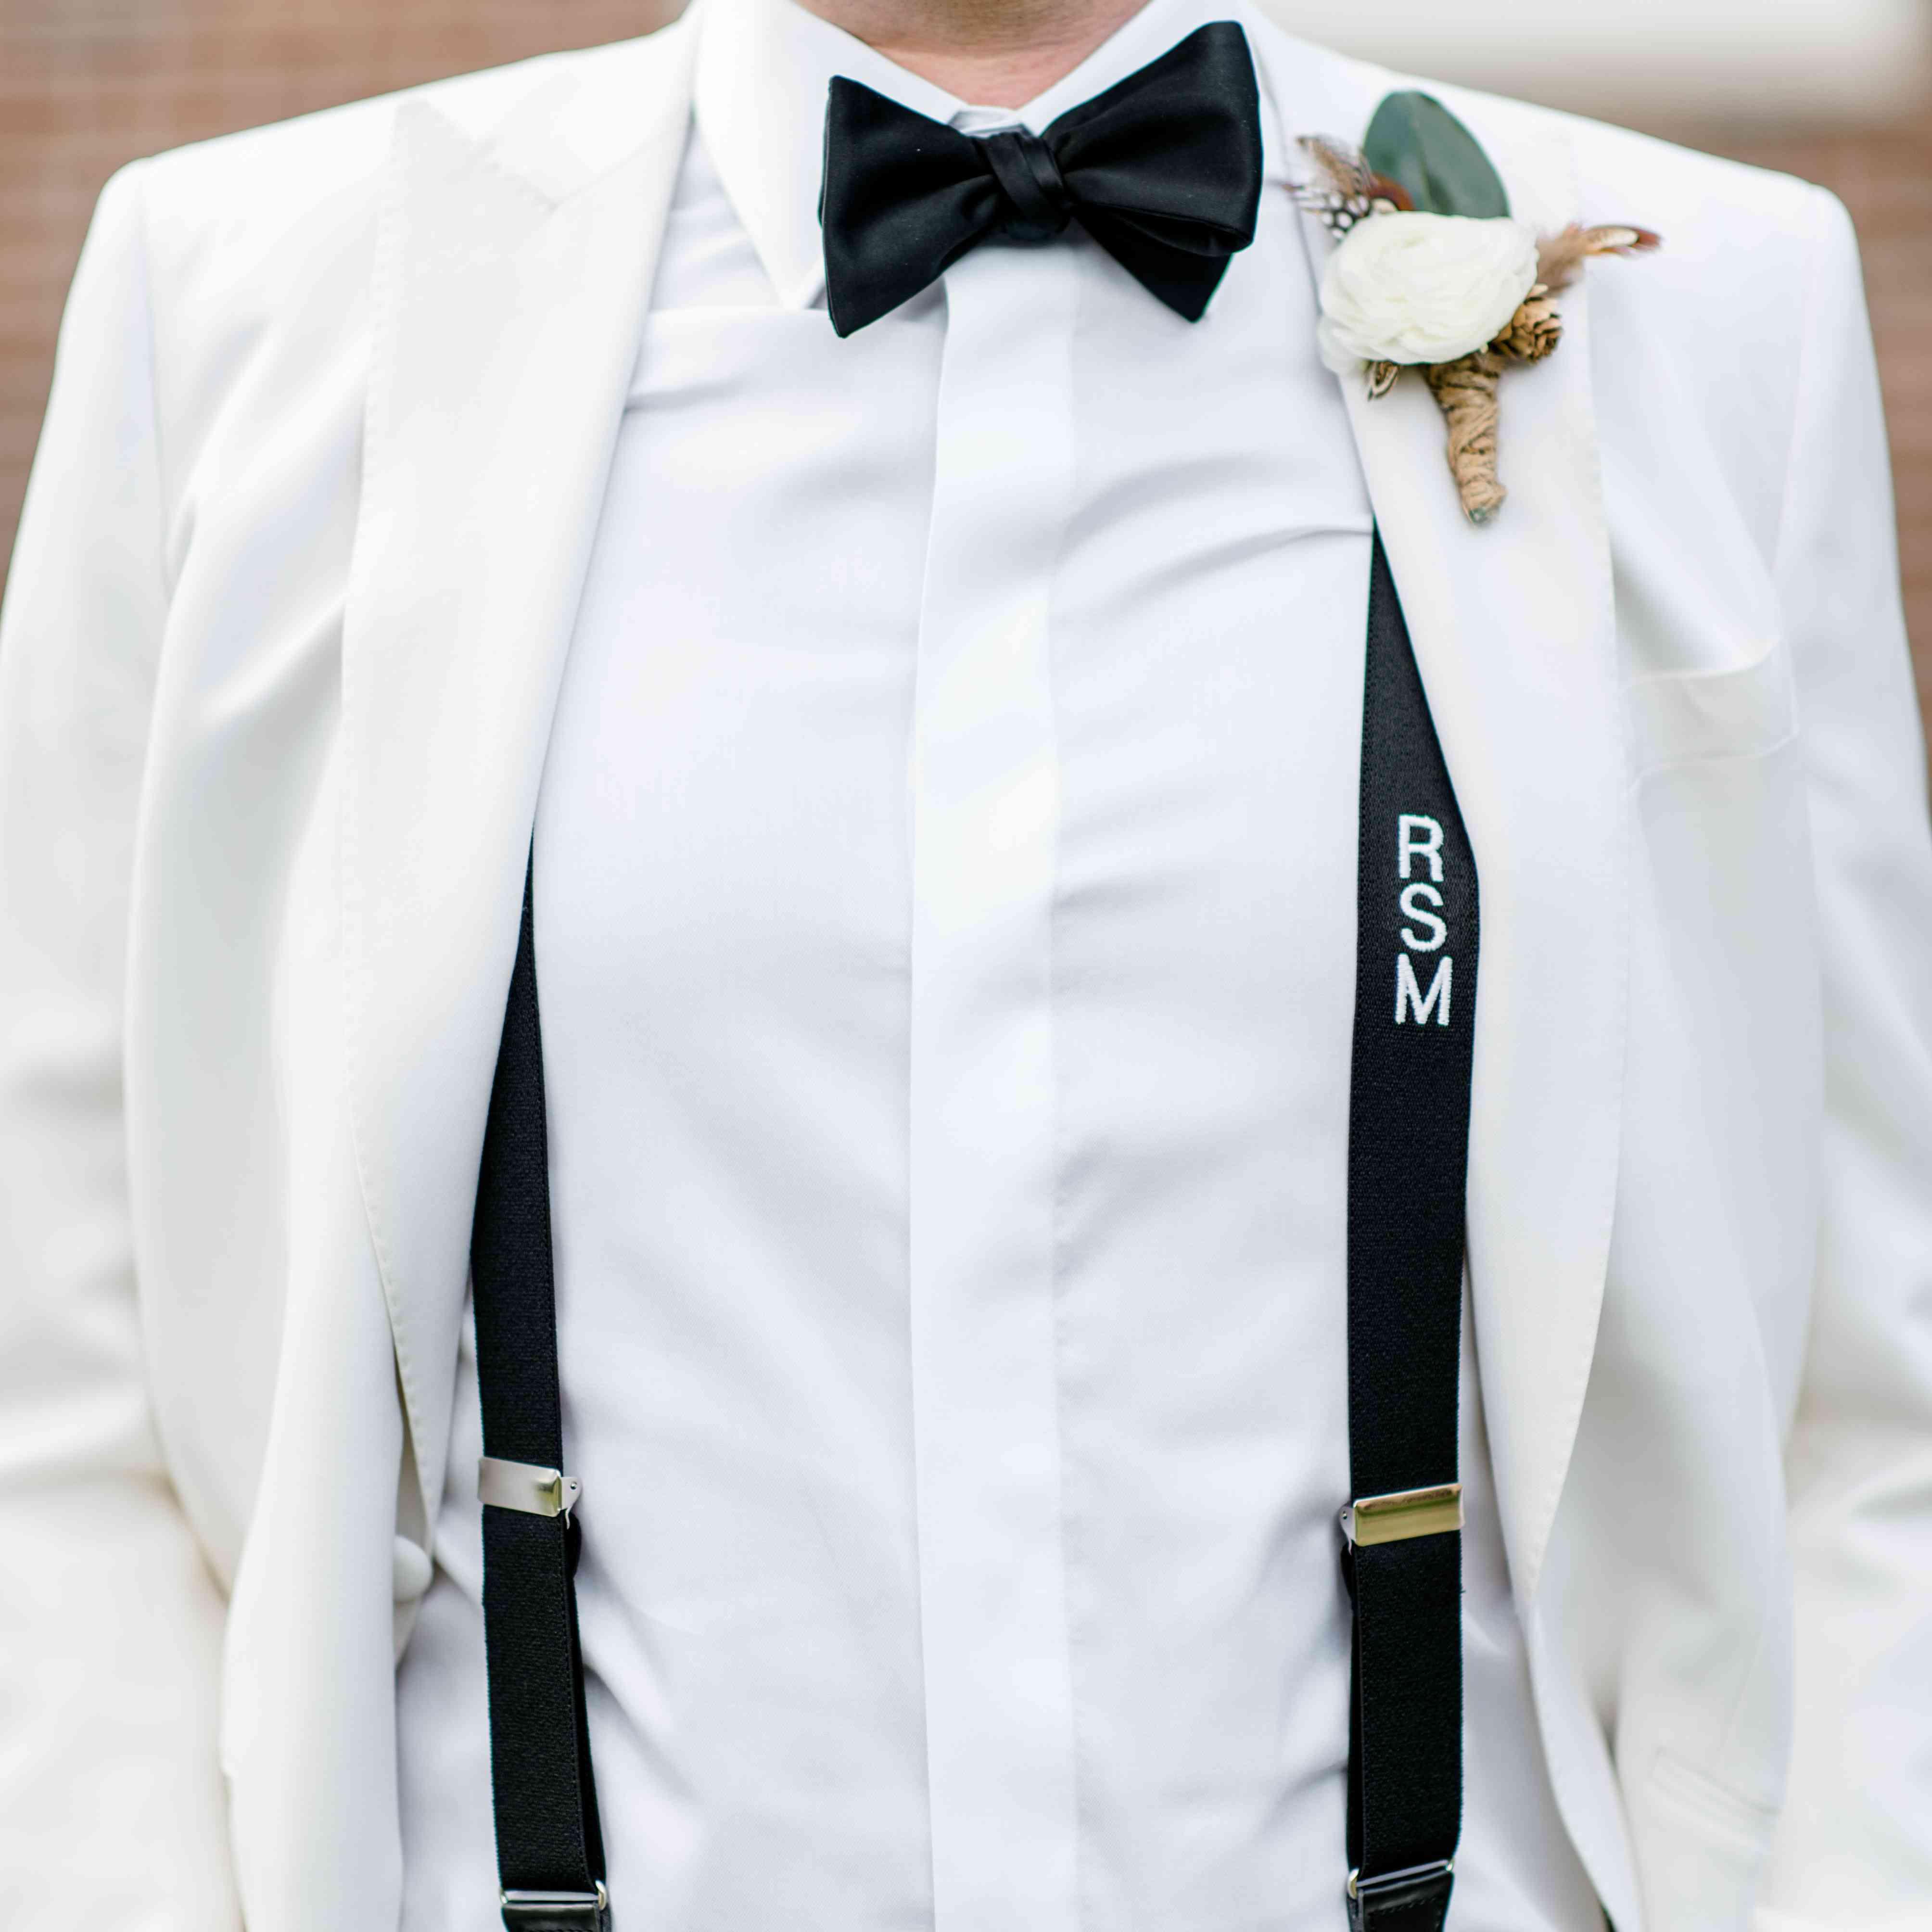 Groom in Tux with Suspenders